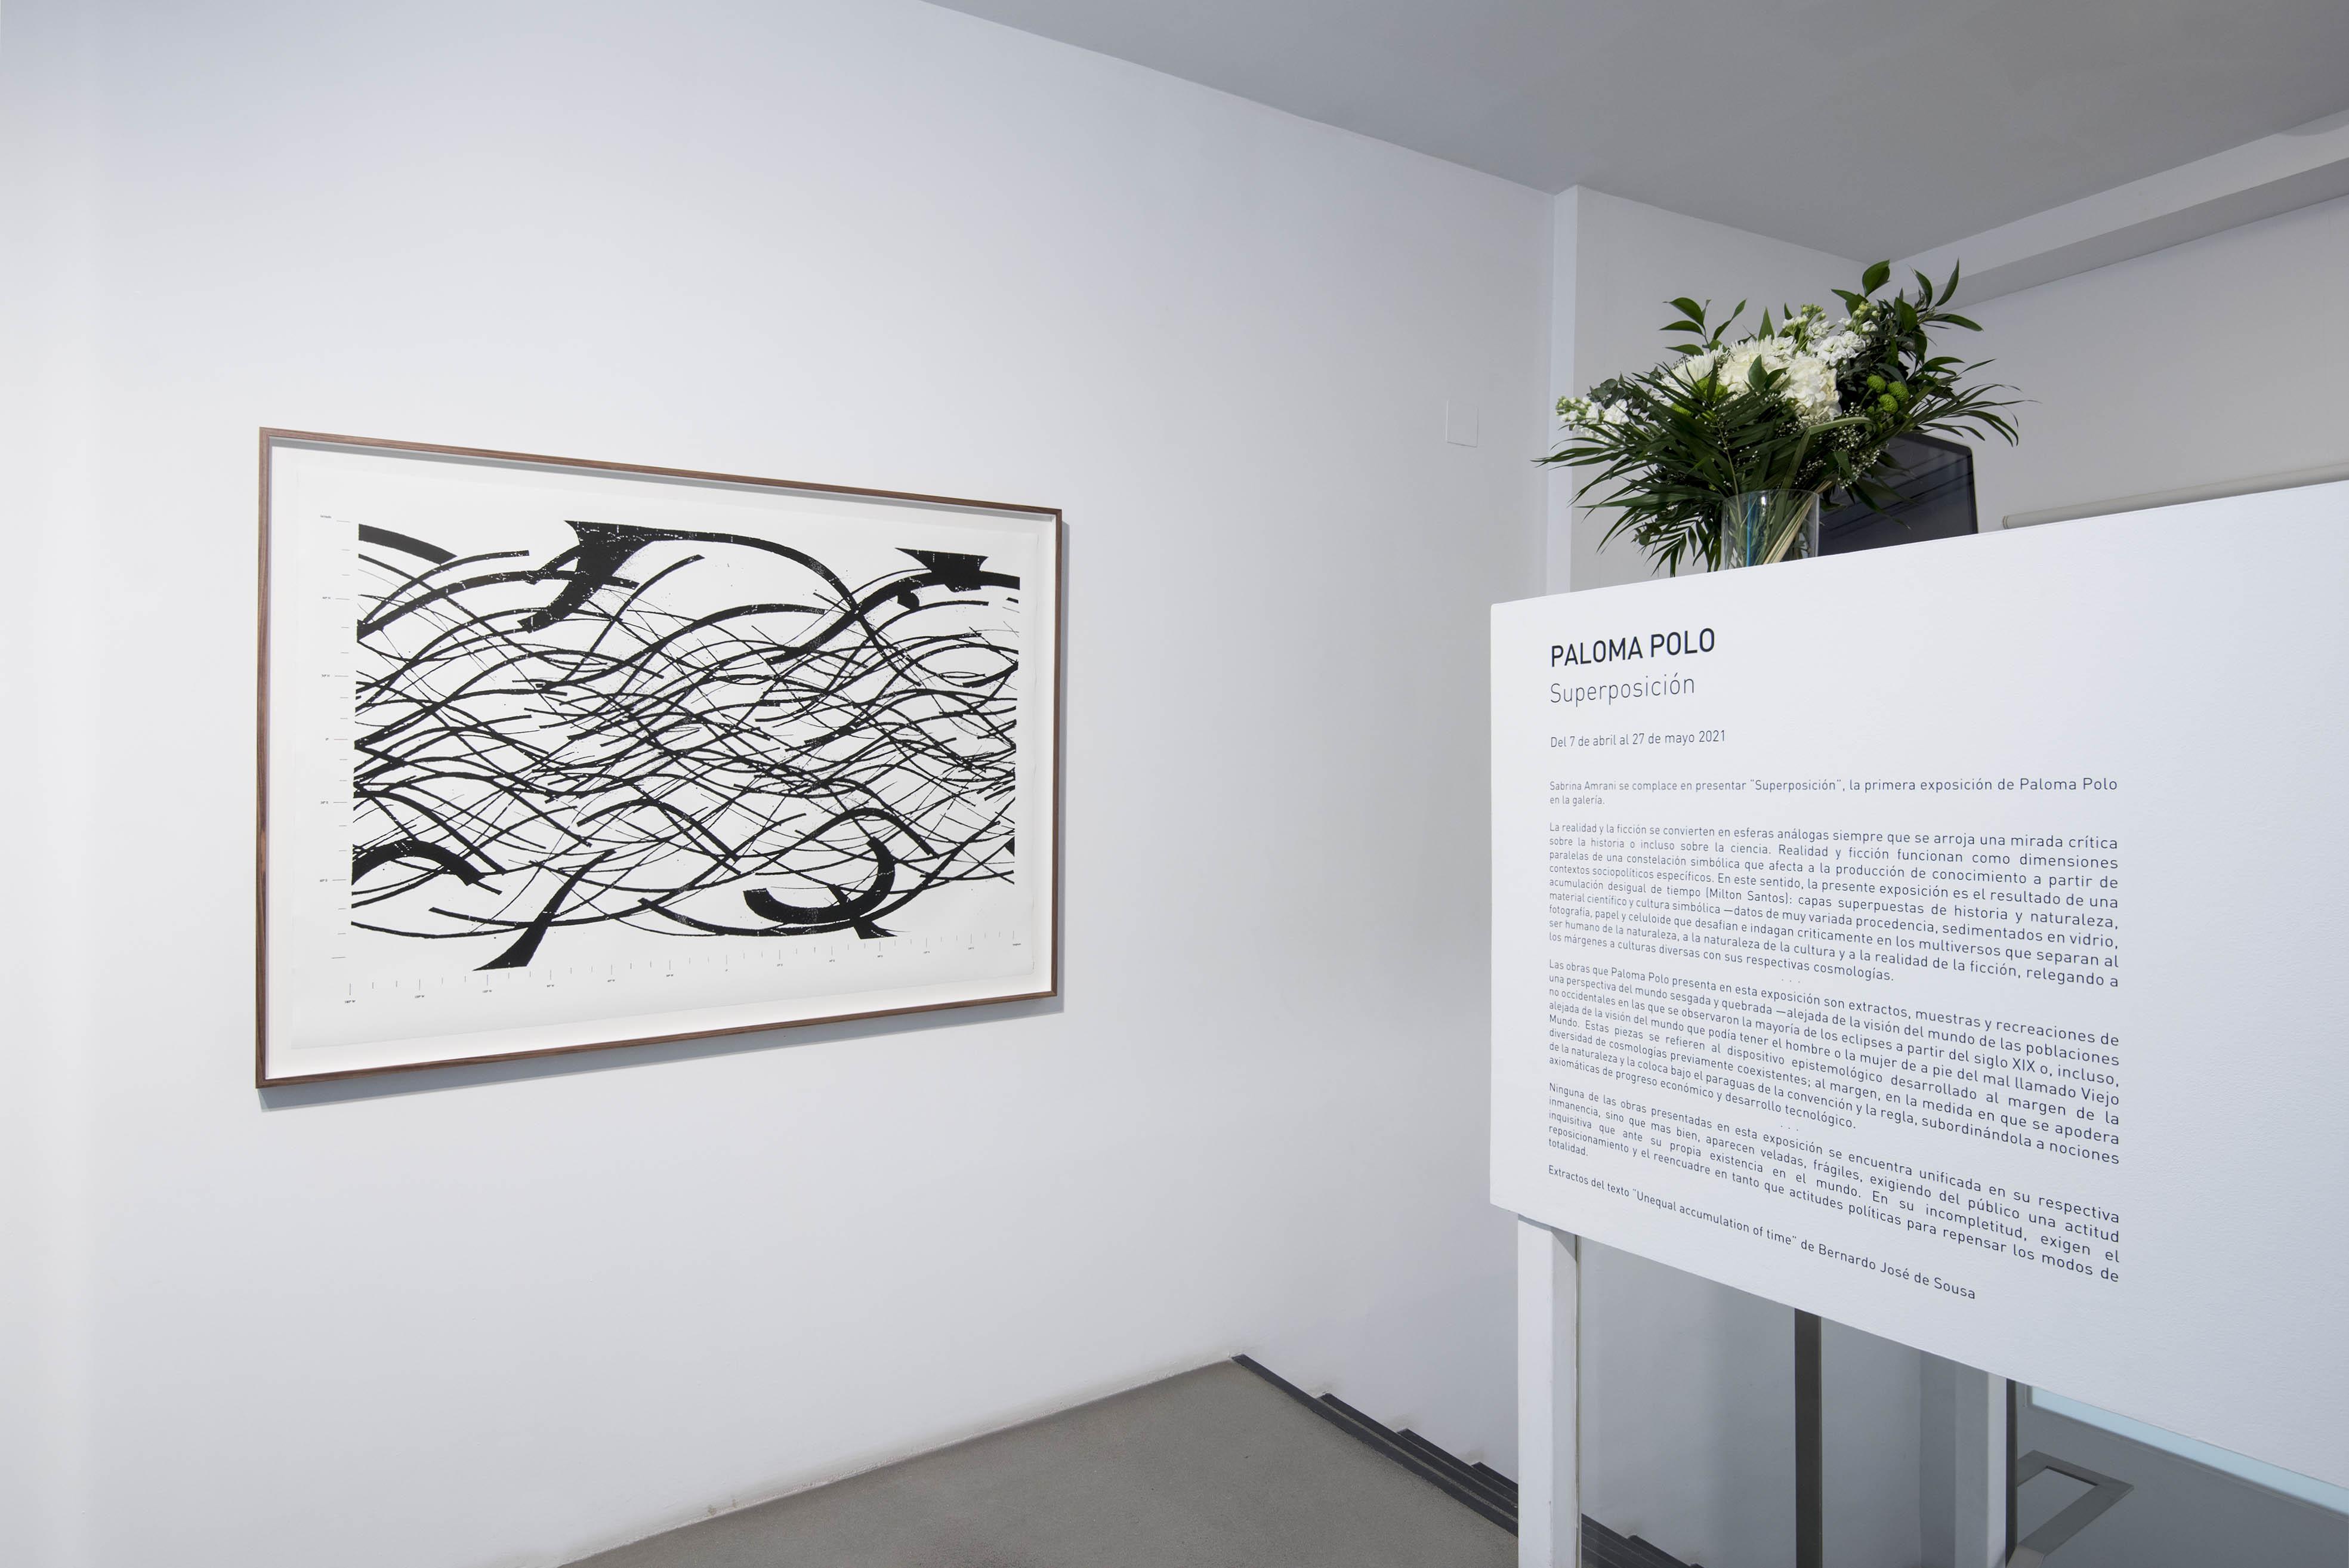 Paloma Polo, Galería Sabrina Amrani, Madrid